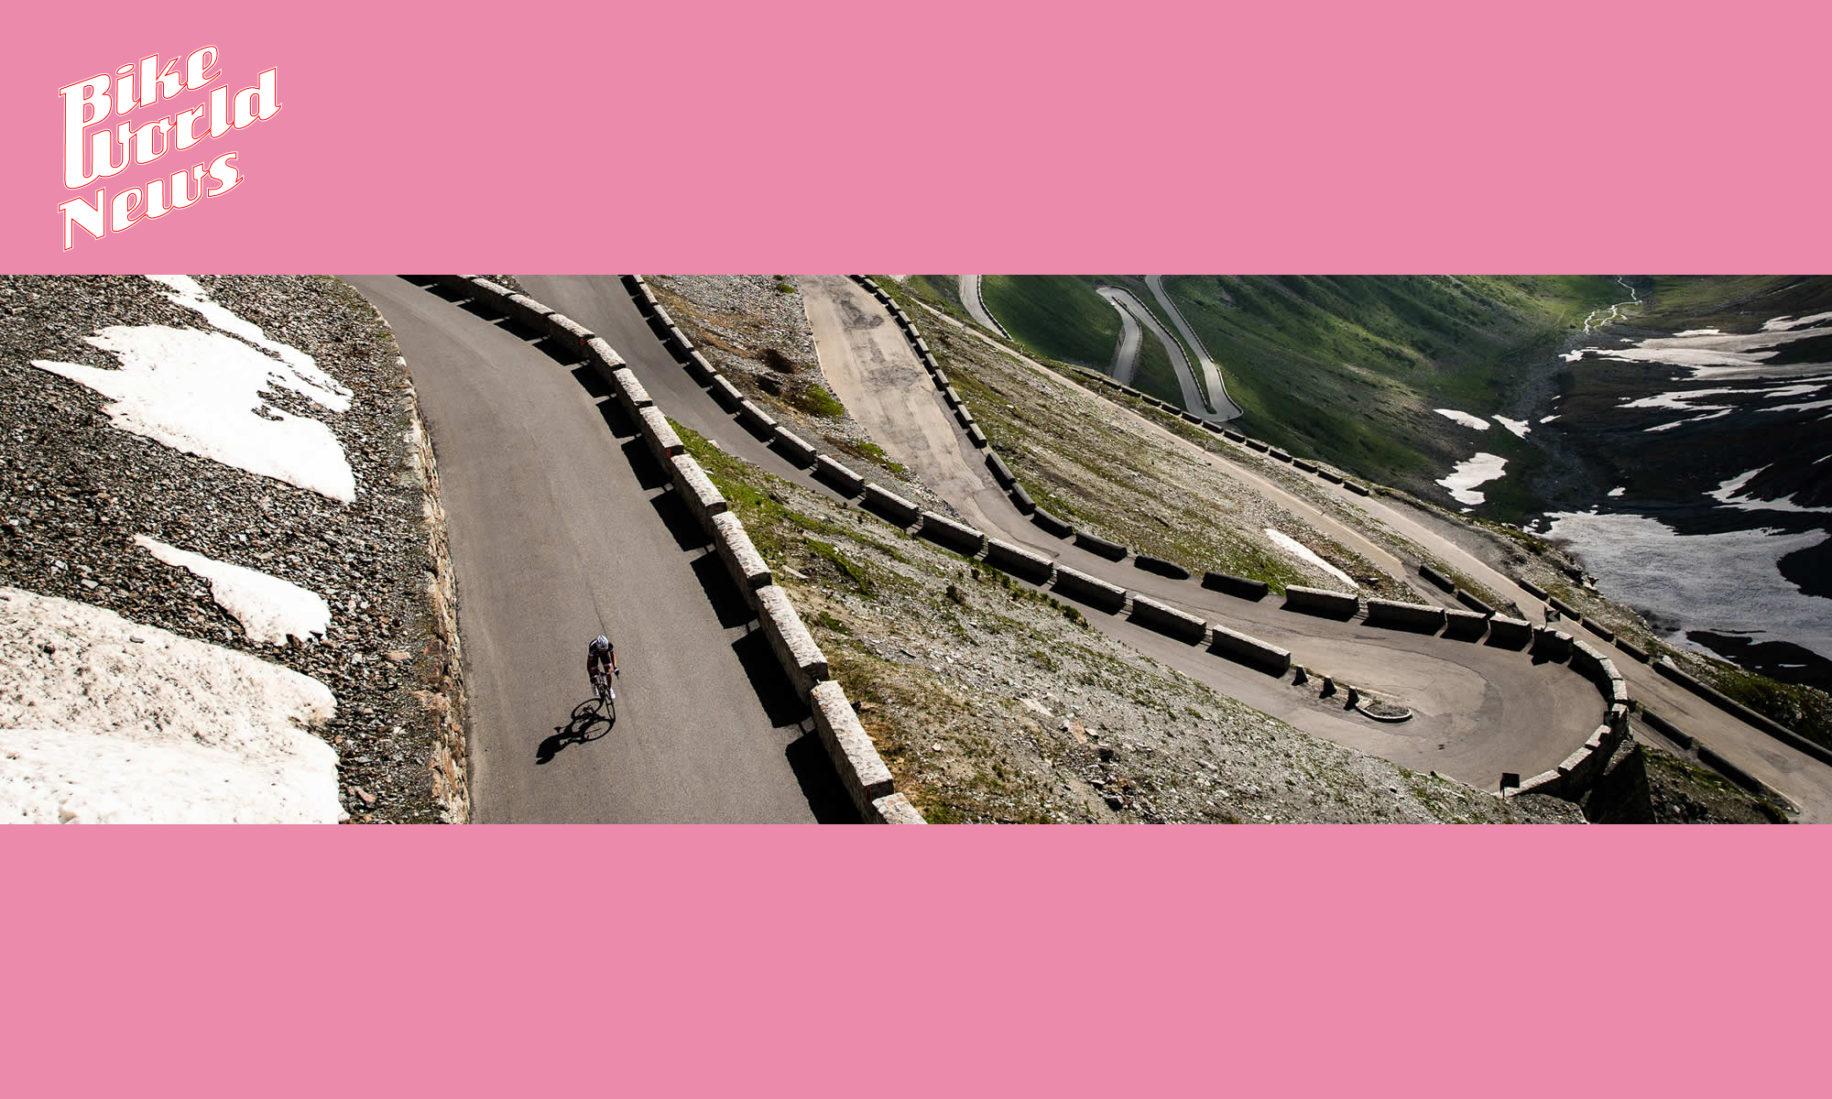 Bike World News